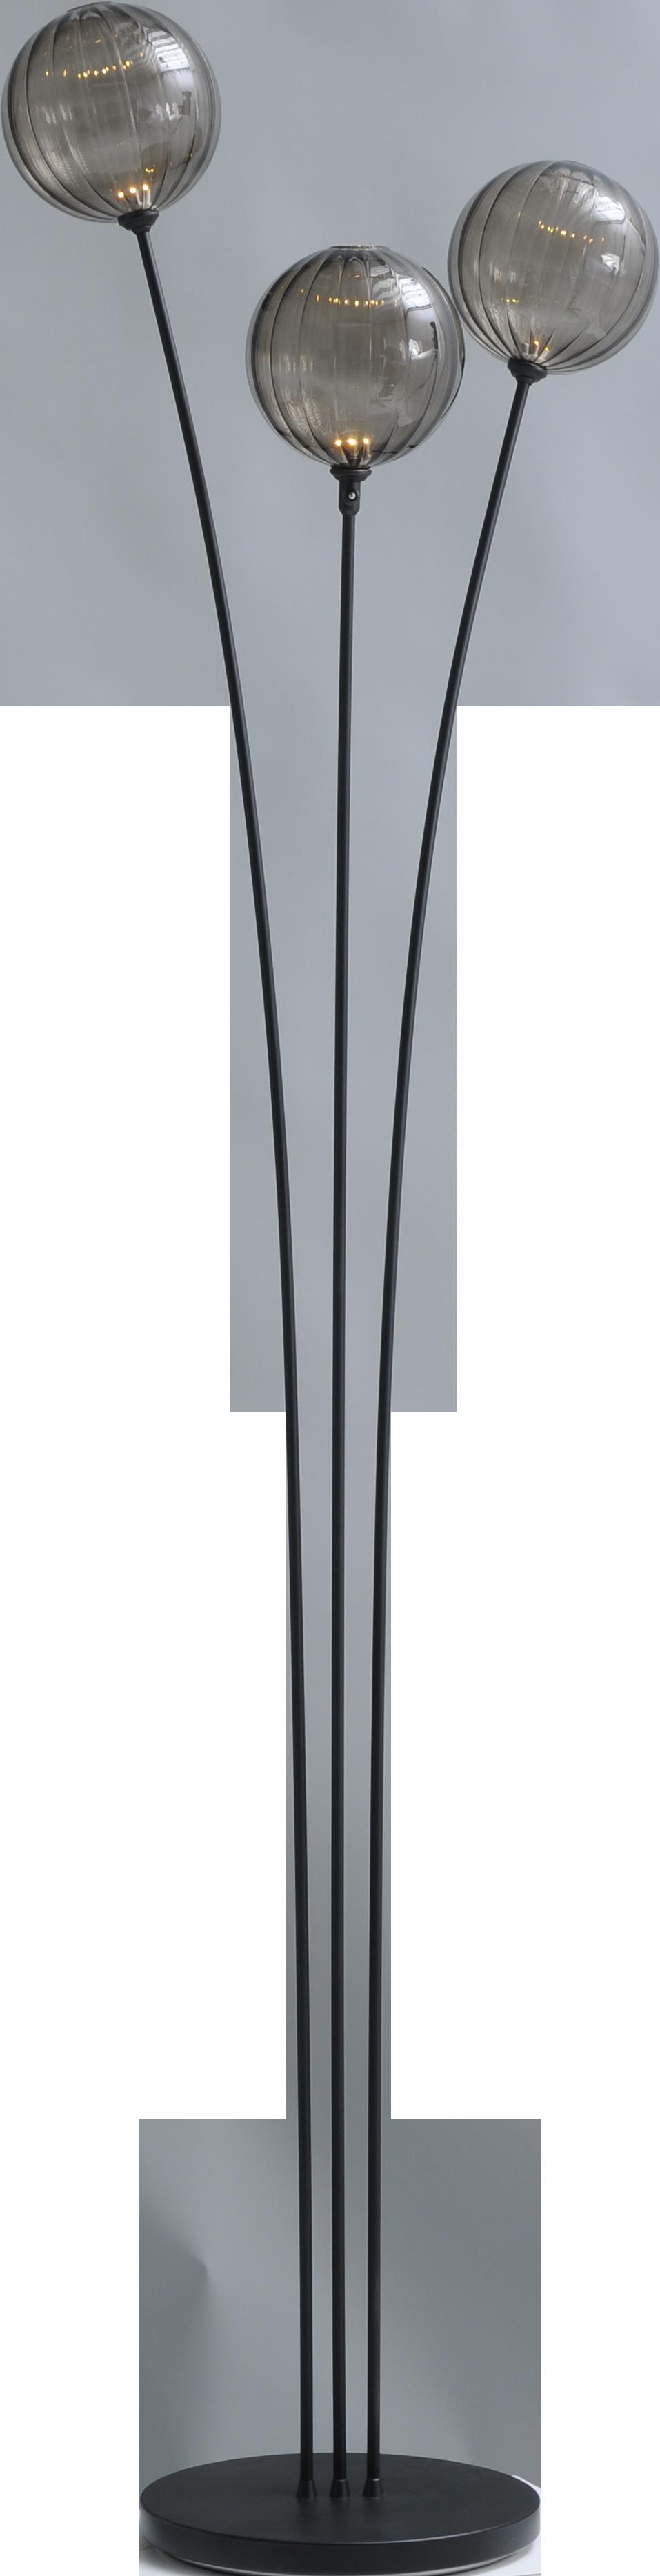 Bocca VL BOCCA BLACK 3LT H.180CM PUSH-DIM